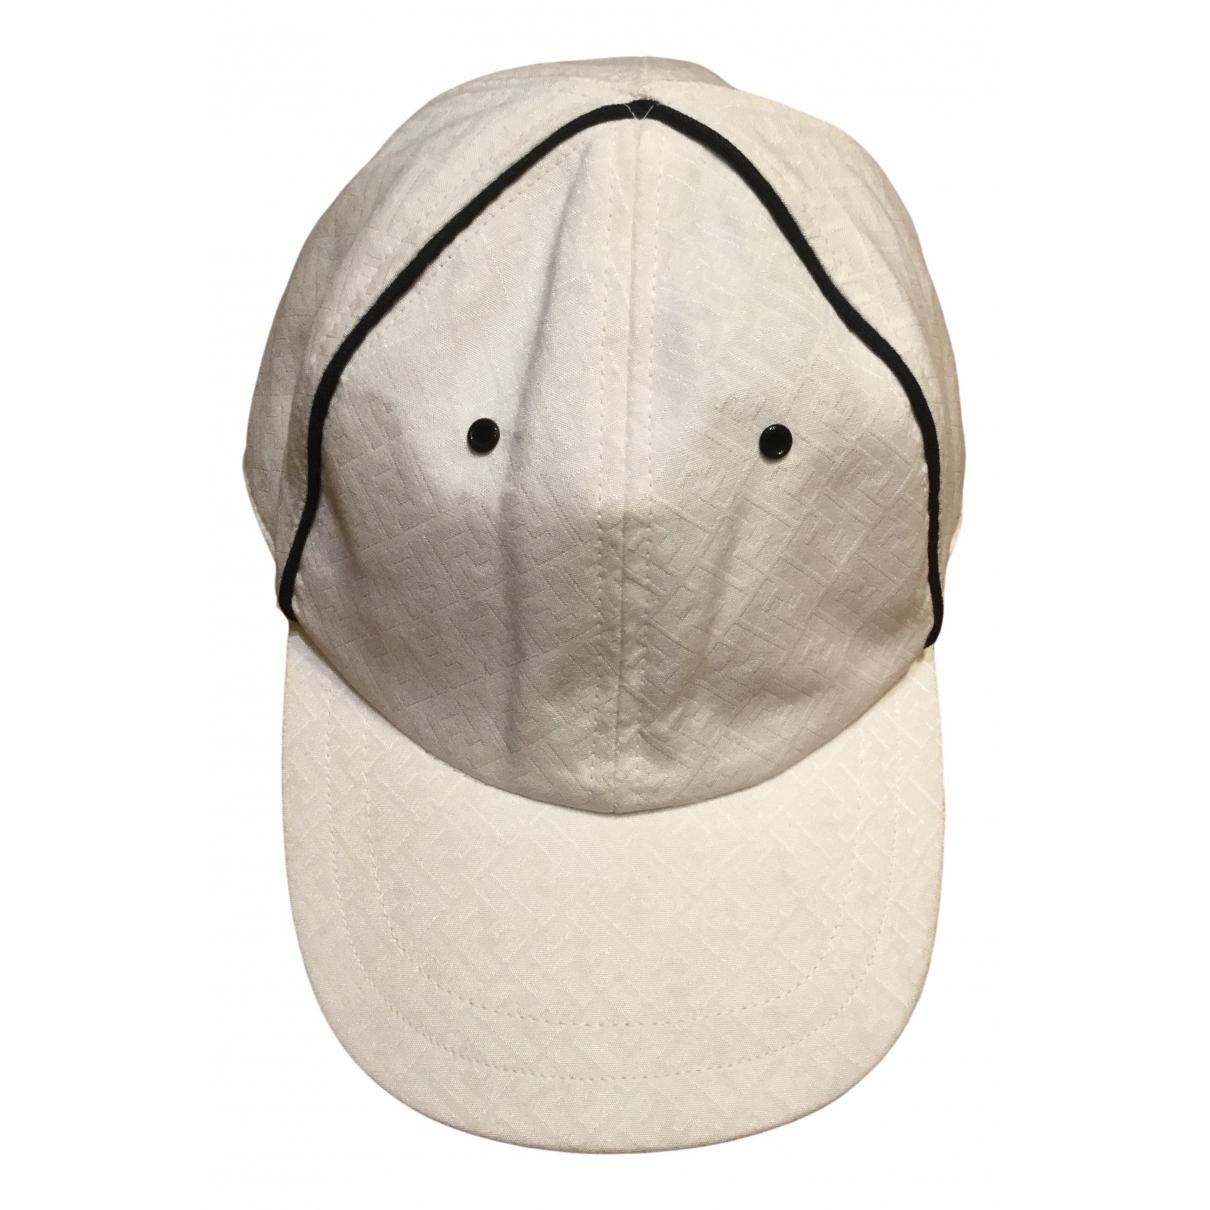 Fendi \N Cloth hat for Women S International